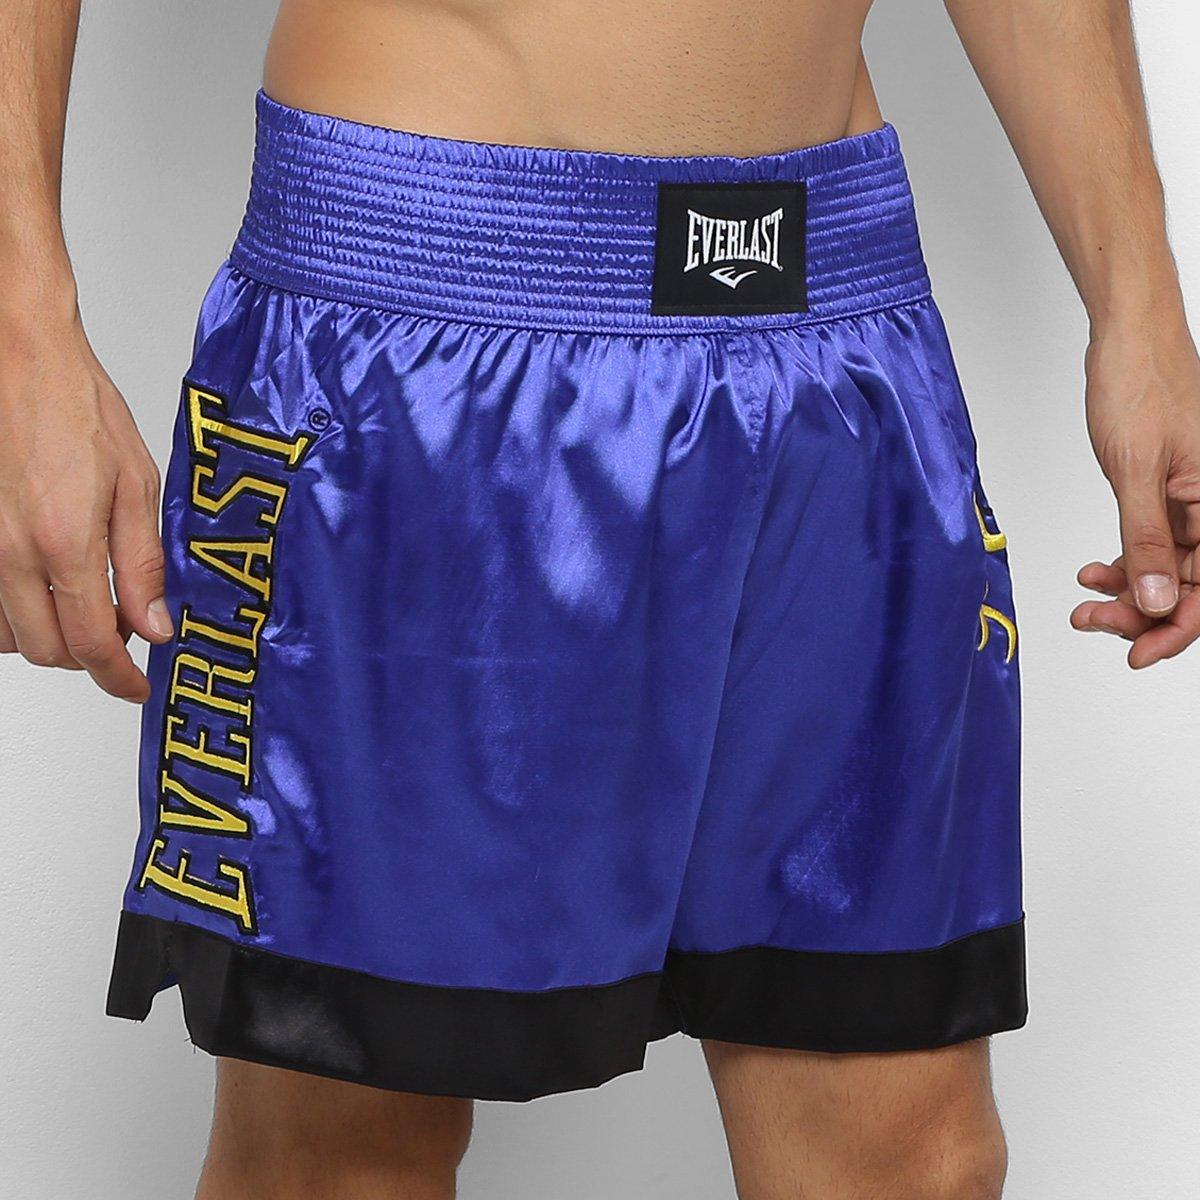 Shorts De Muay Thai/Boxe Everlast